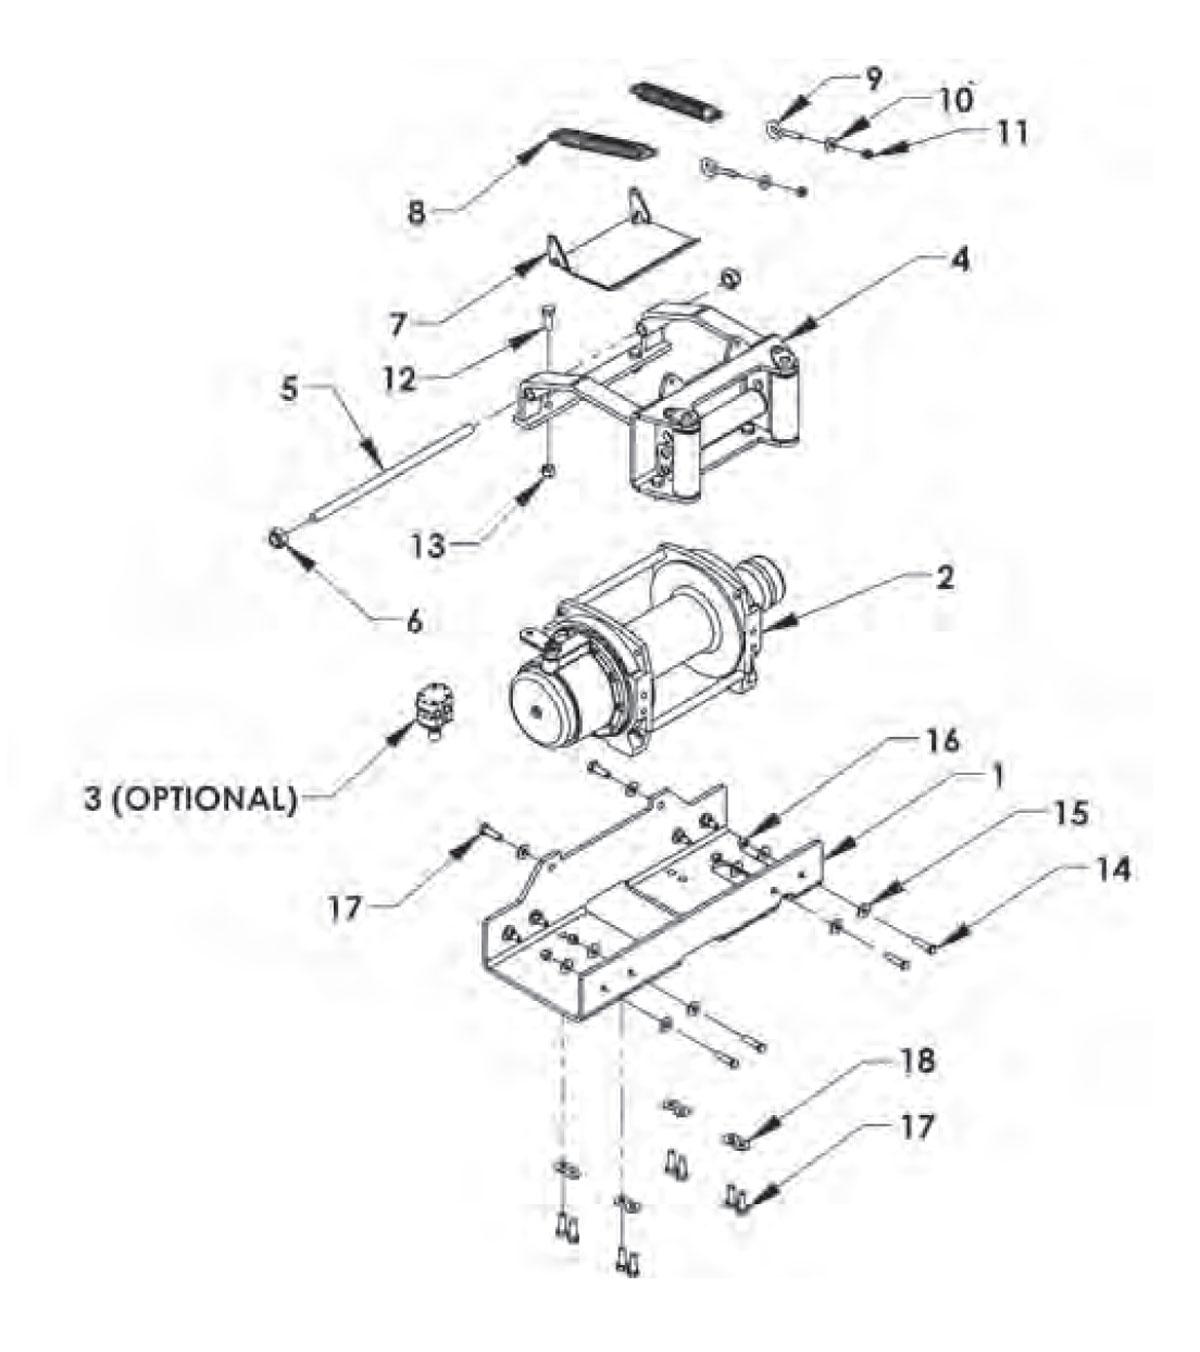 Wiring Diagram For Warn 12 000 Lb Winch